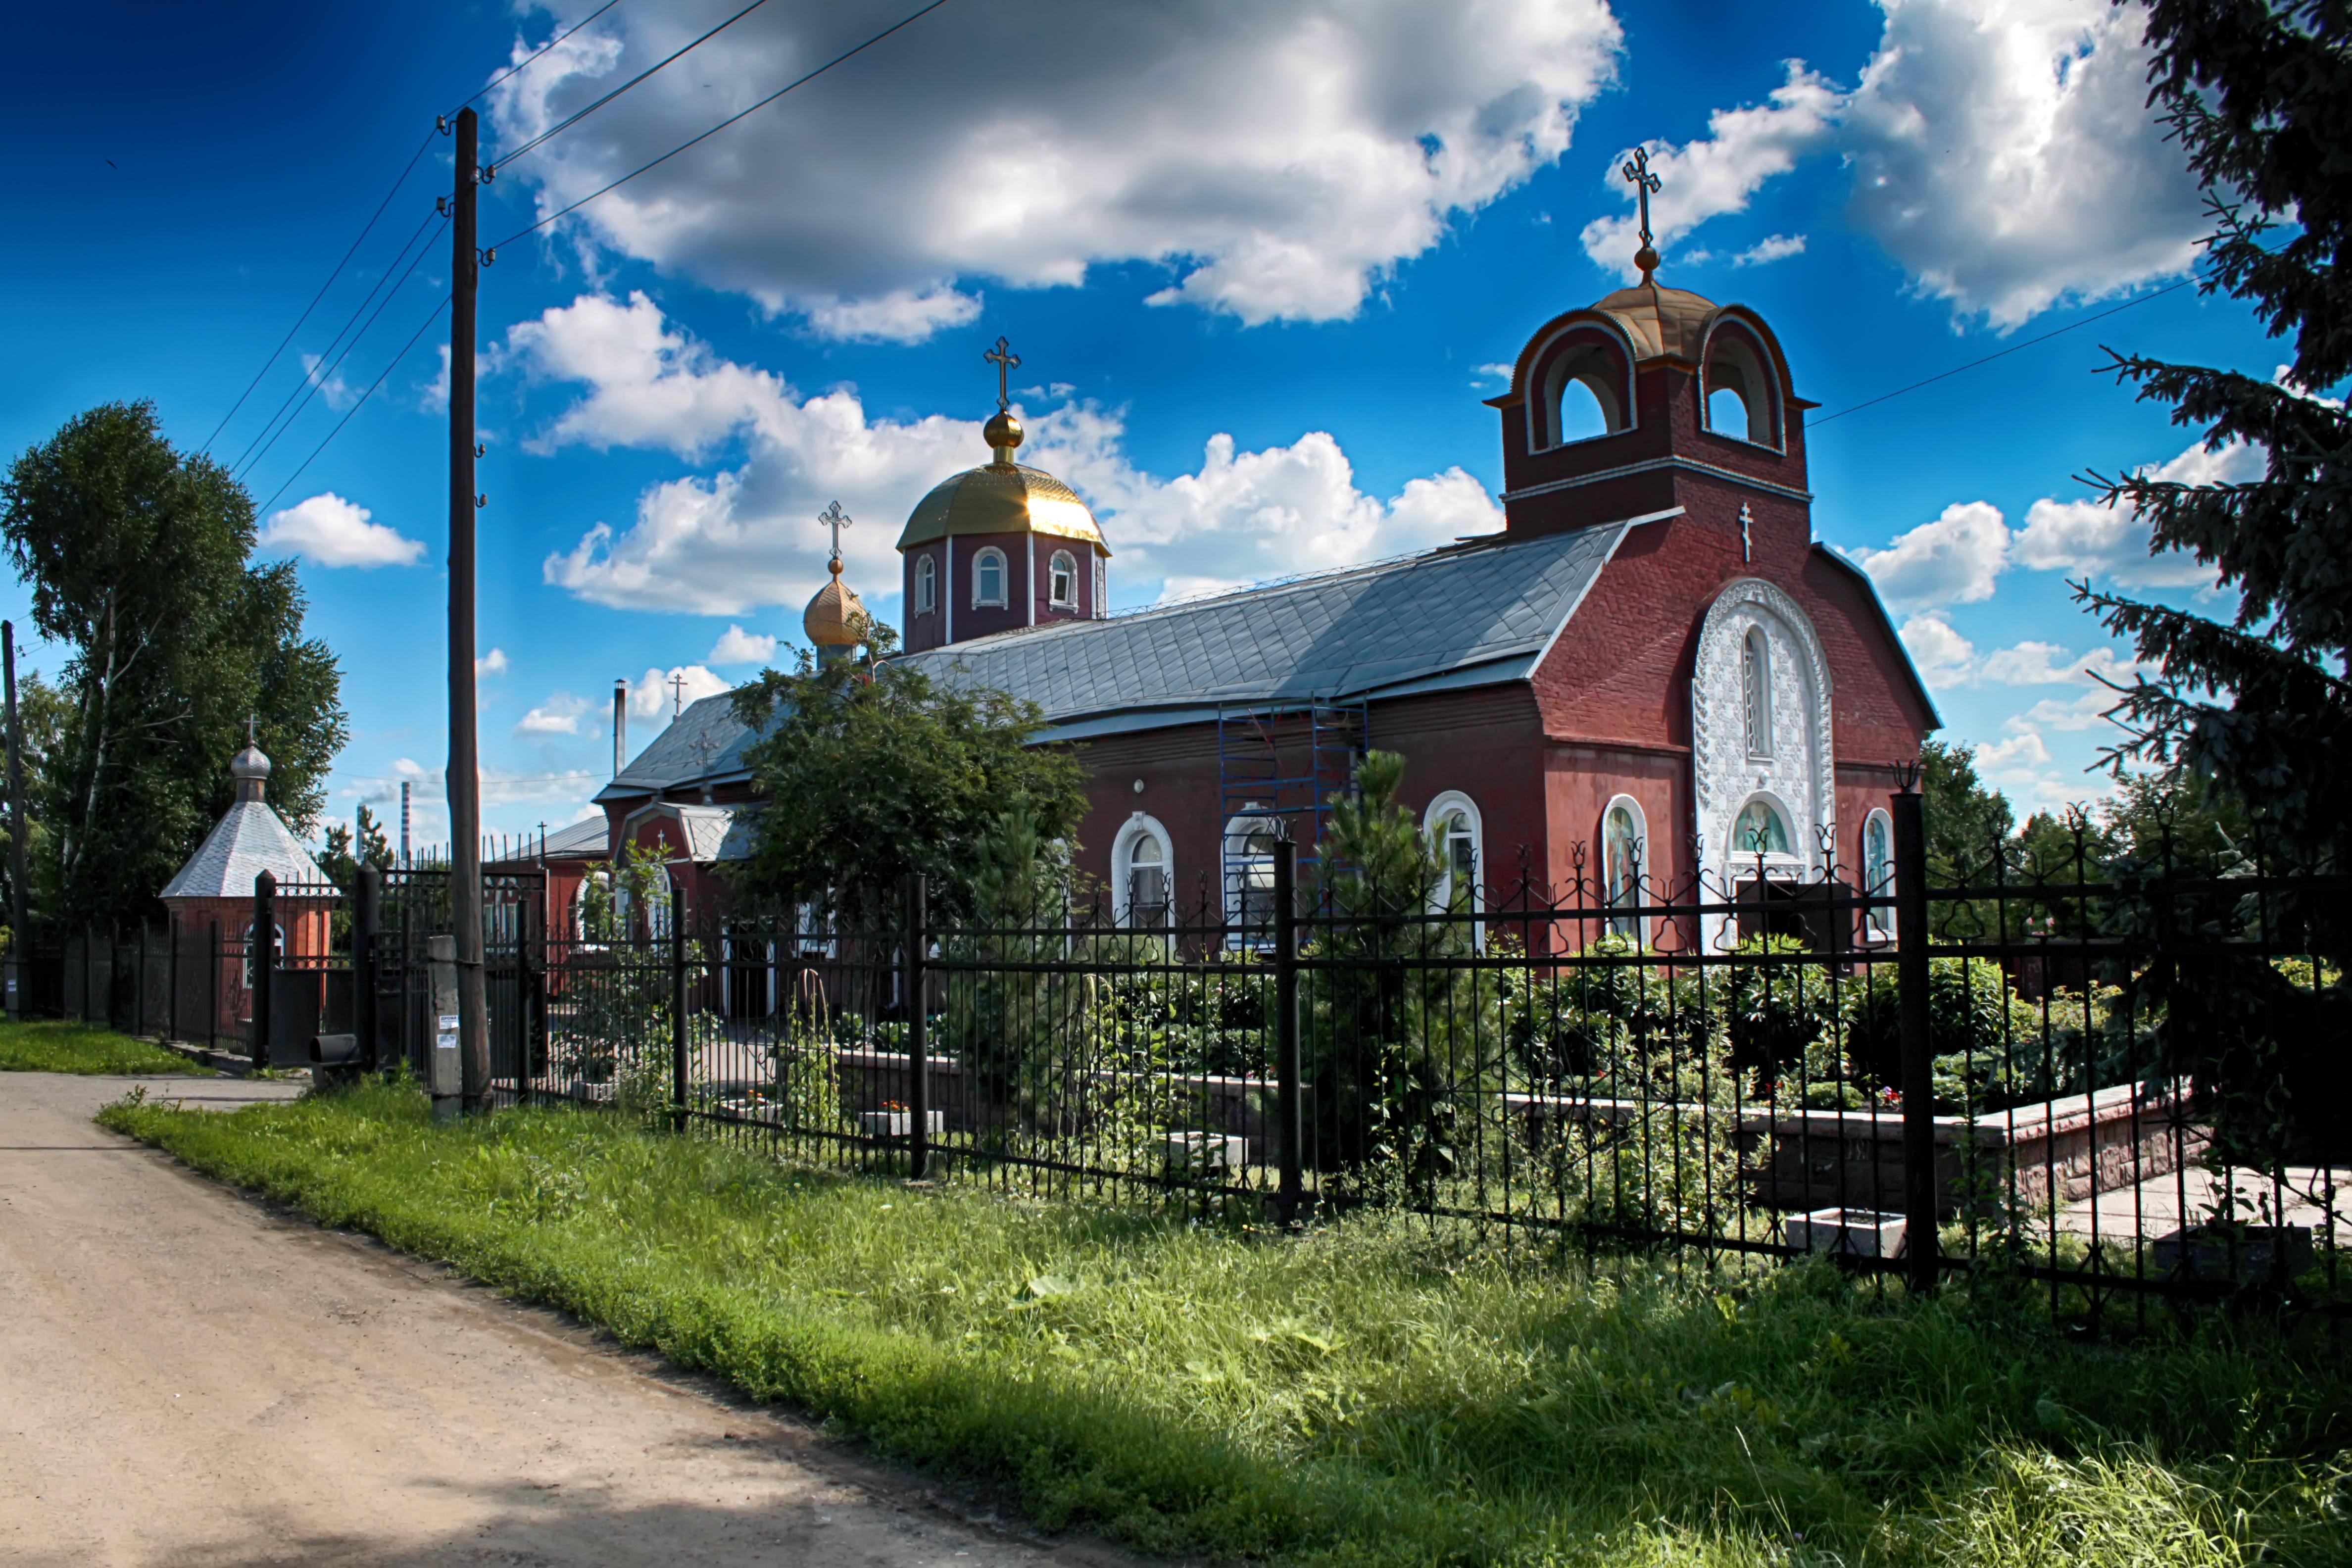 Никольский собор Кемерово 2010-07-24 © Nick Patrin.jpg